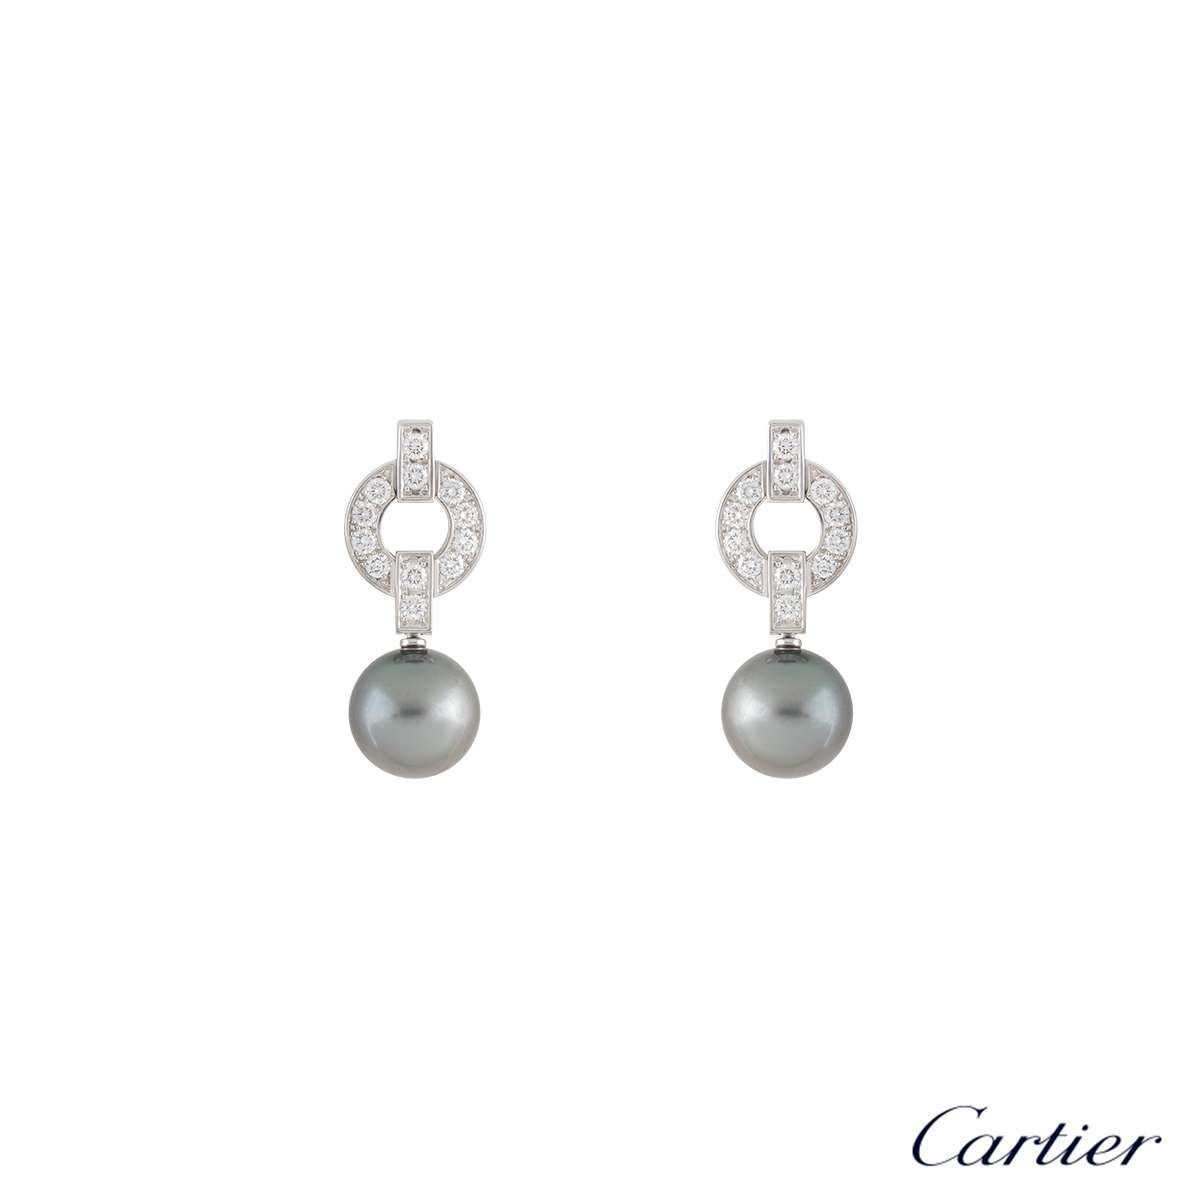 Cartier Himaliacollection Whitegold Diamonds Pearl Earrings Venezia Italy